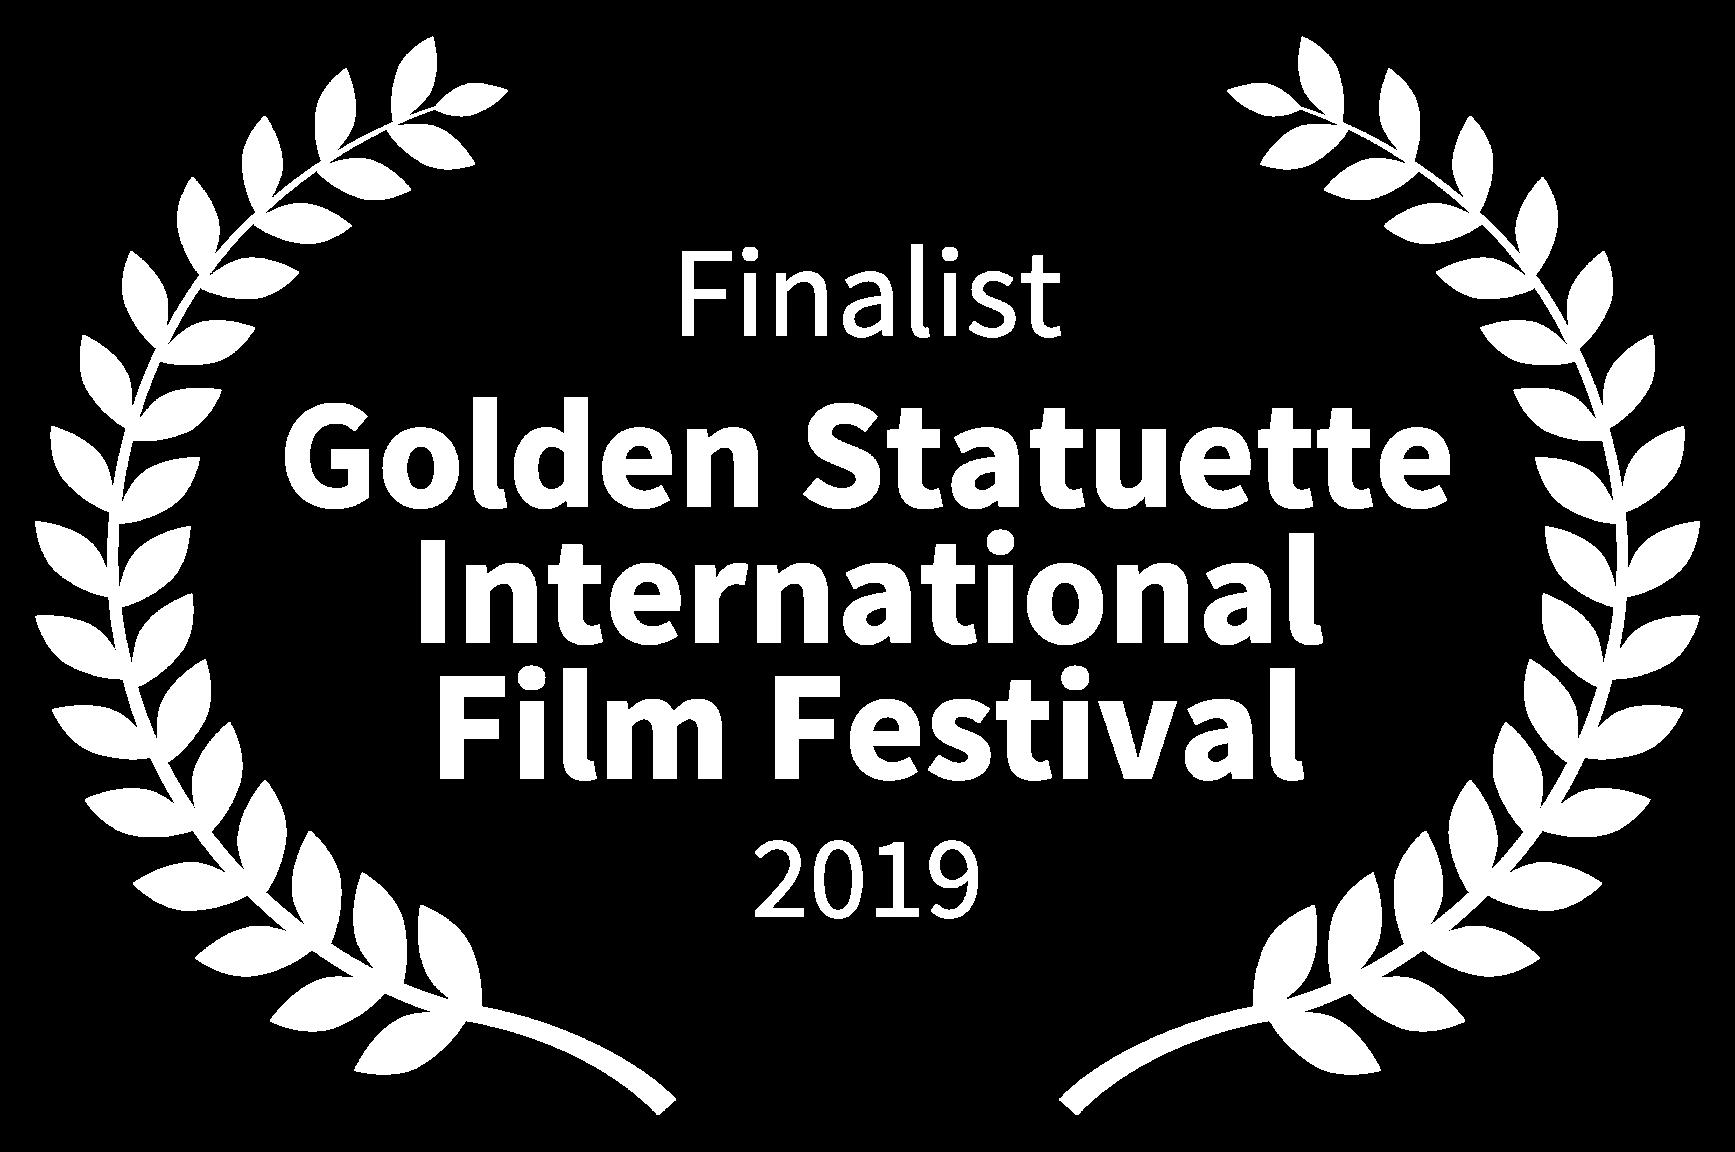 Finalist - Golden Statuette Internationa